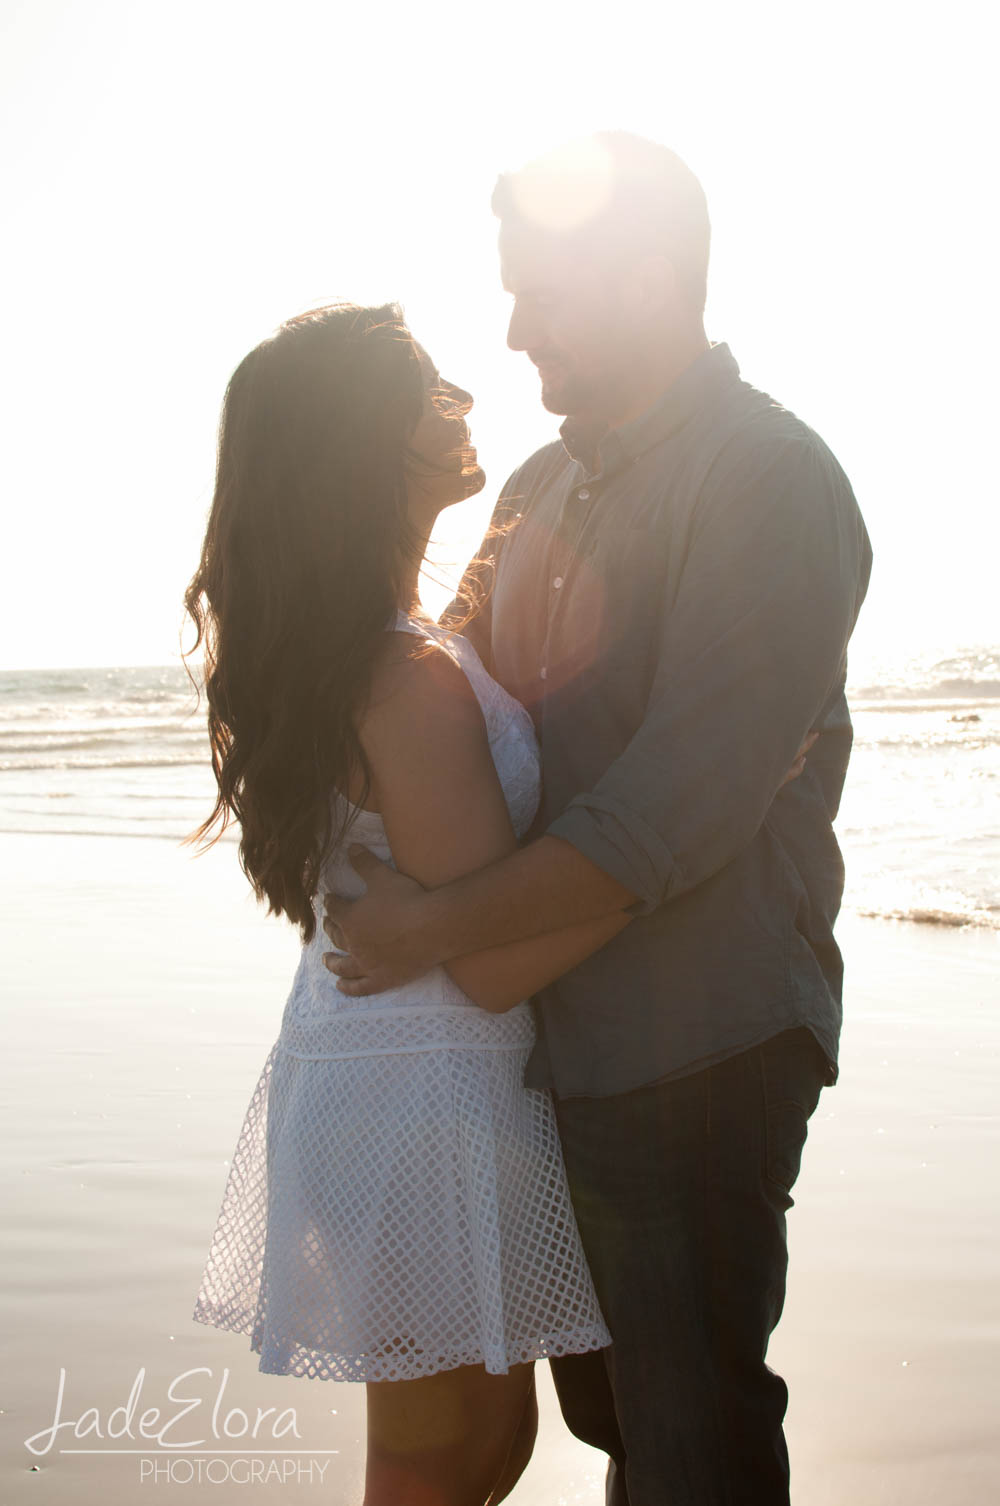 JadeEloraPhotography-Engagement-Wedding-Blog-13.jpg